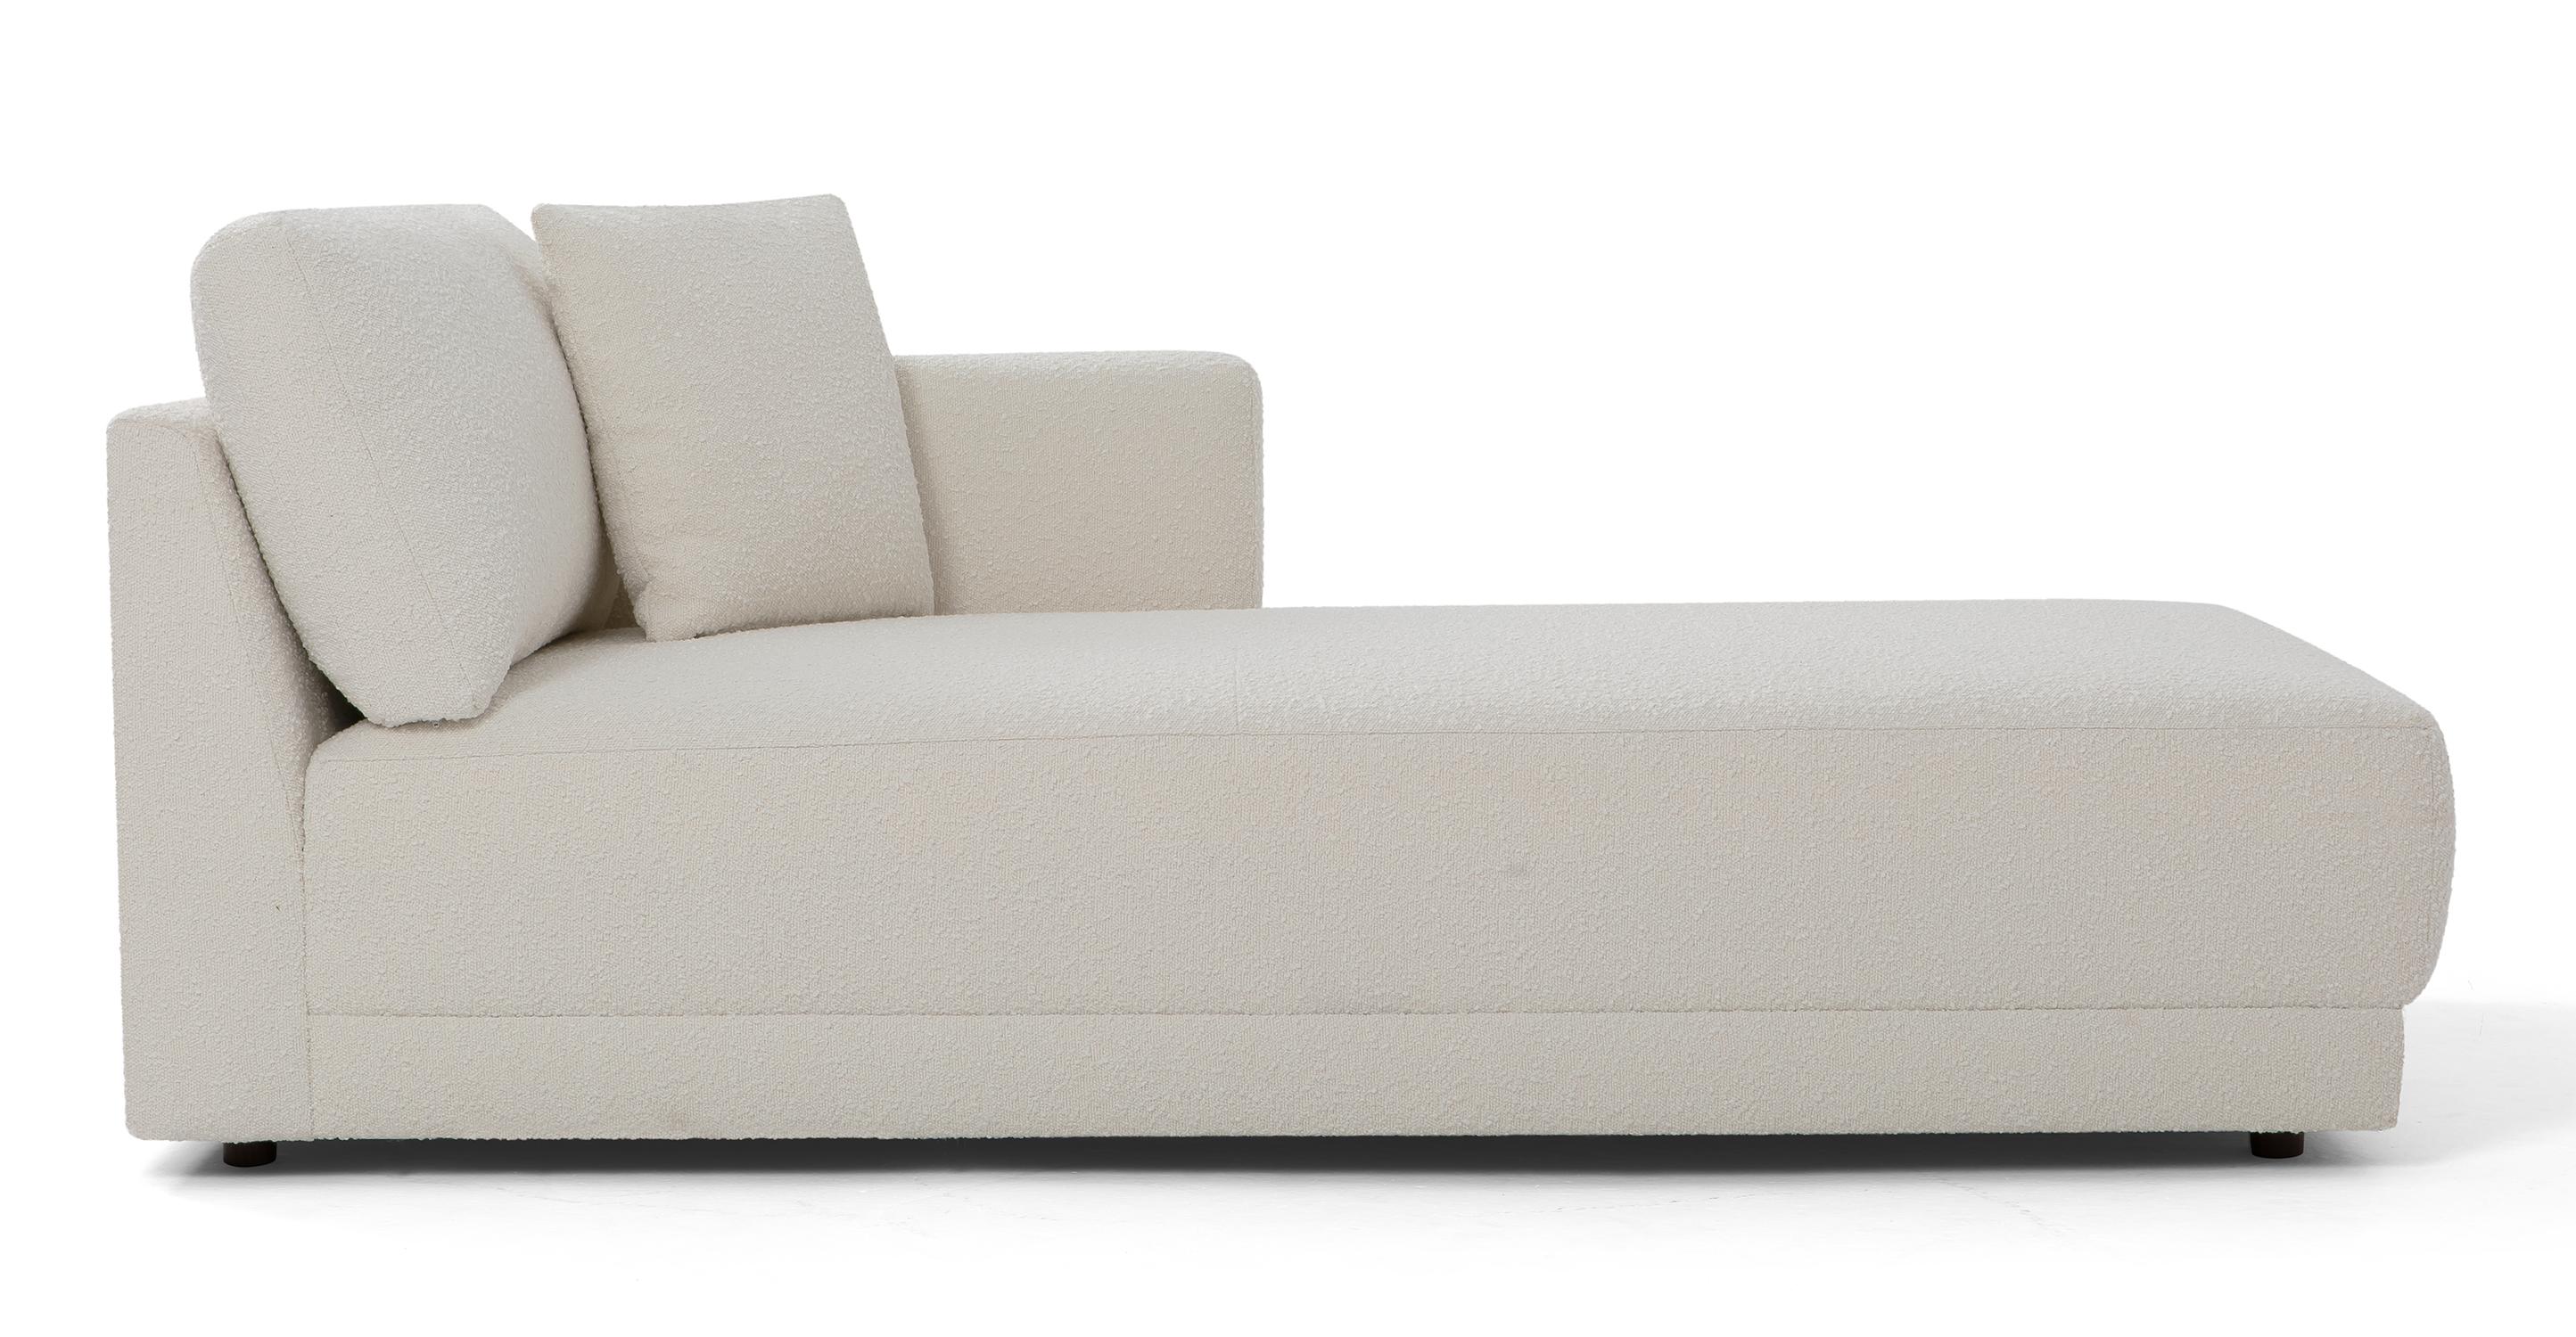 "Domus 39"" Right Chaise Fabric Sofa, Blanc Boucle"